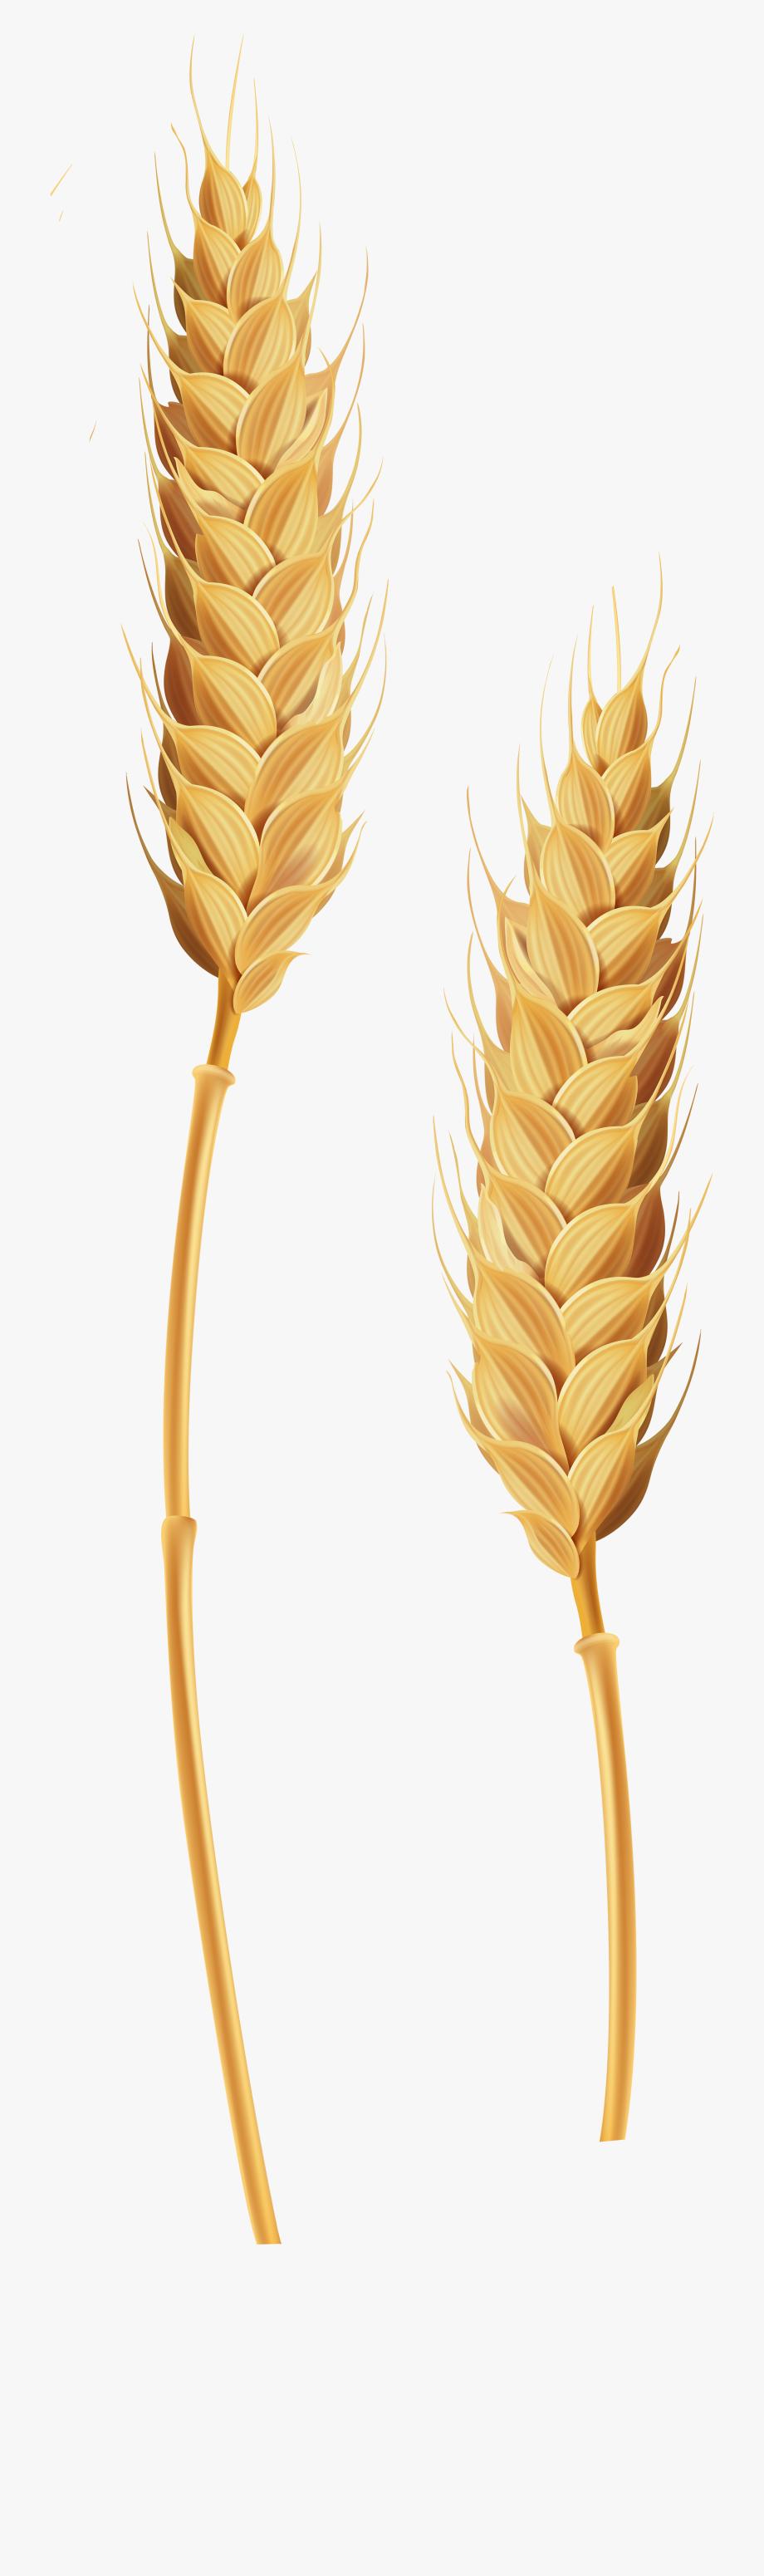 Stalks transparent clip art. Wheat clipart wheat stem